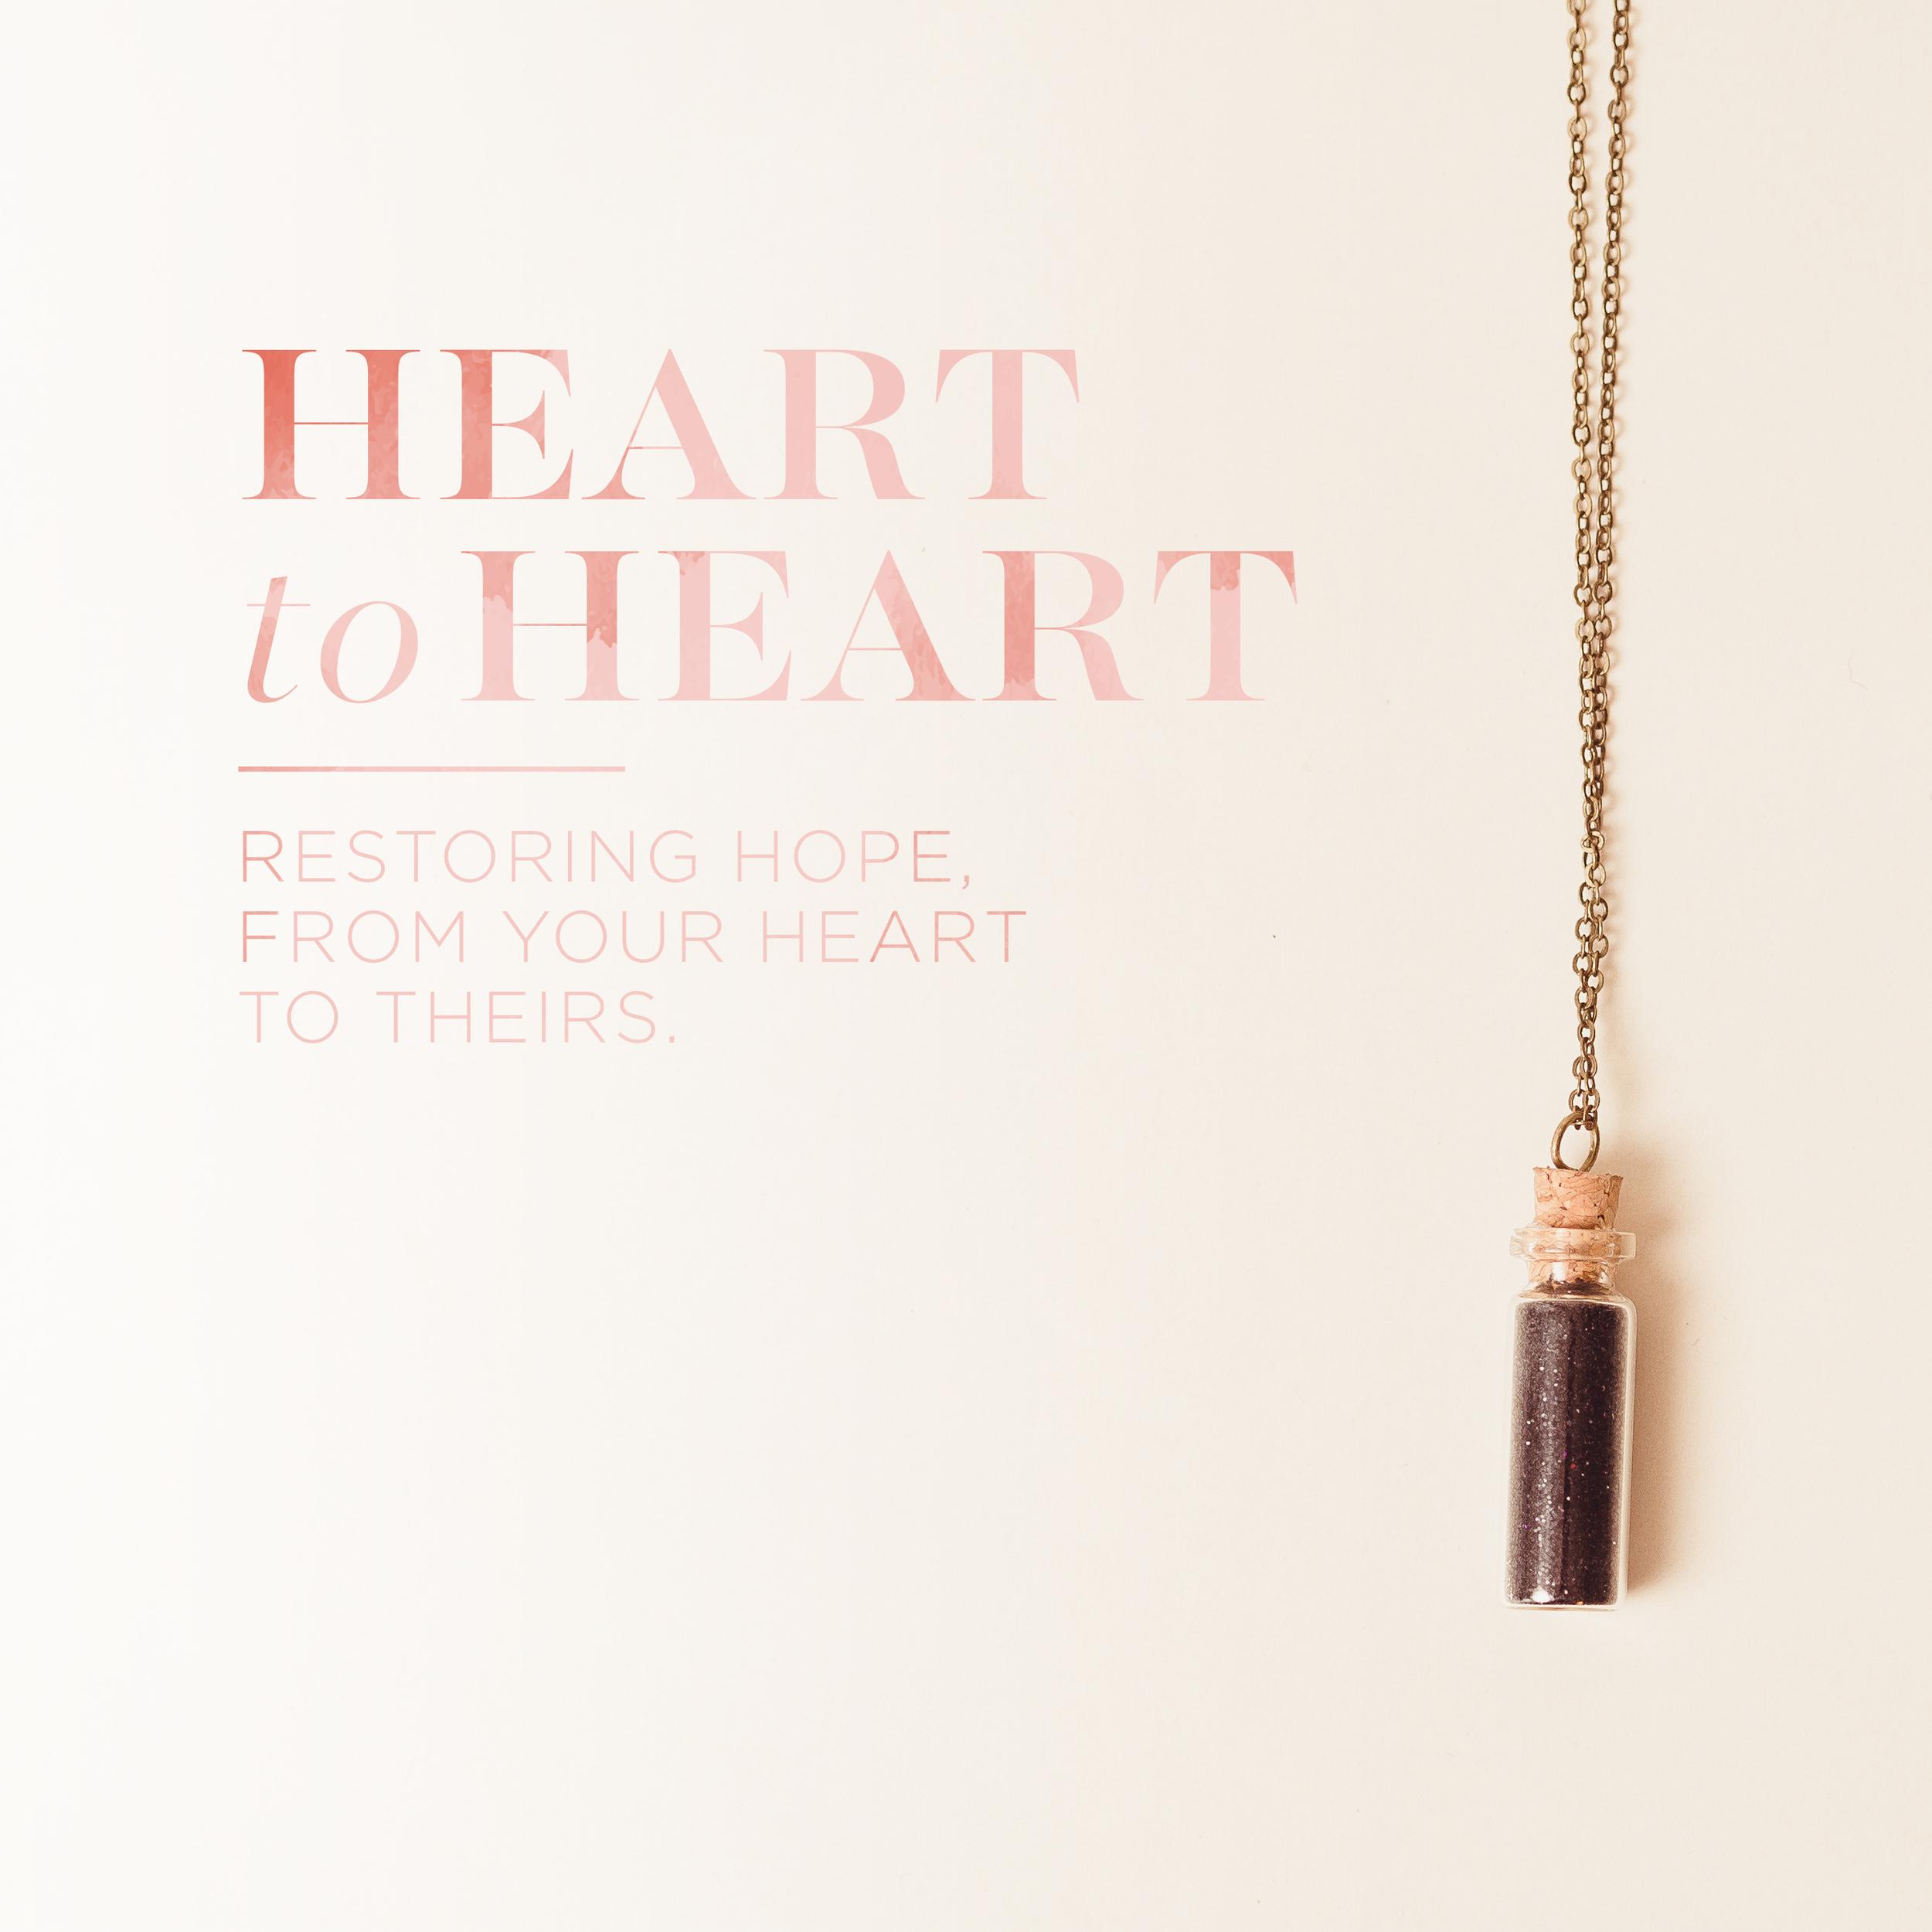 hearttoheart1 (2).jpg